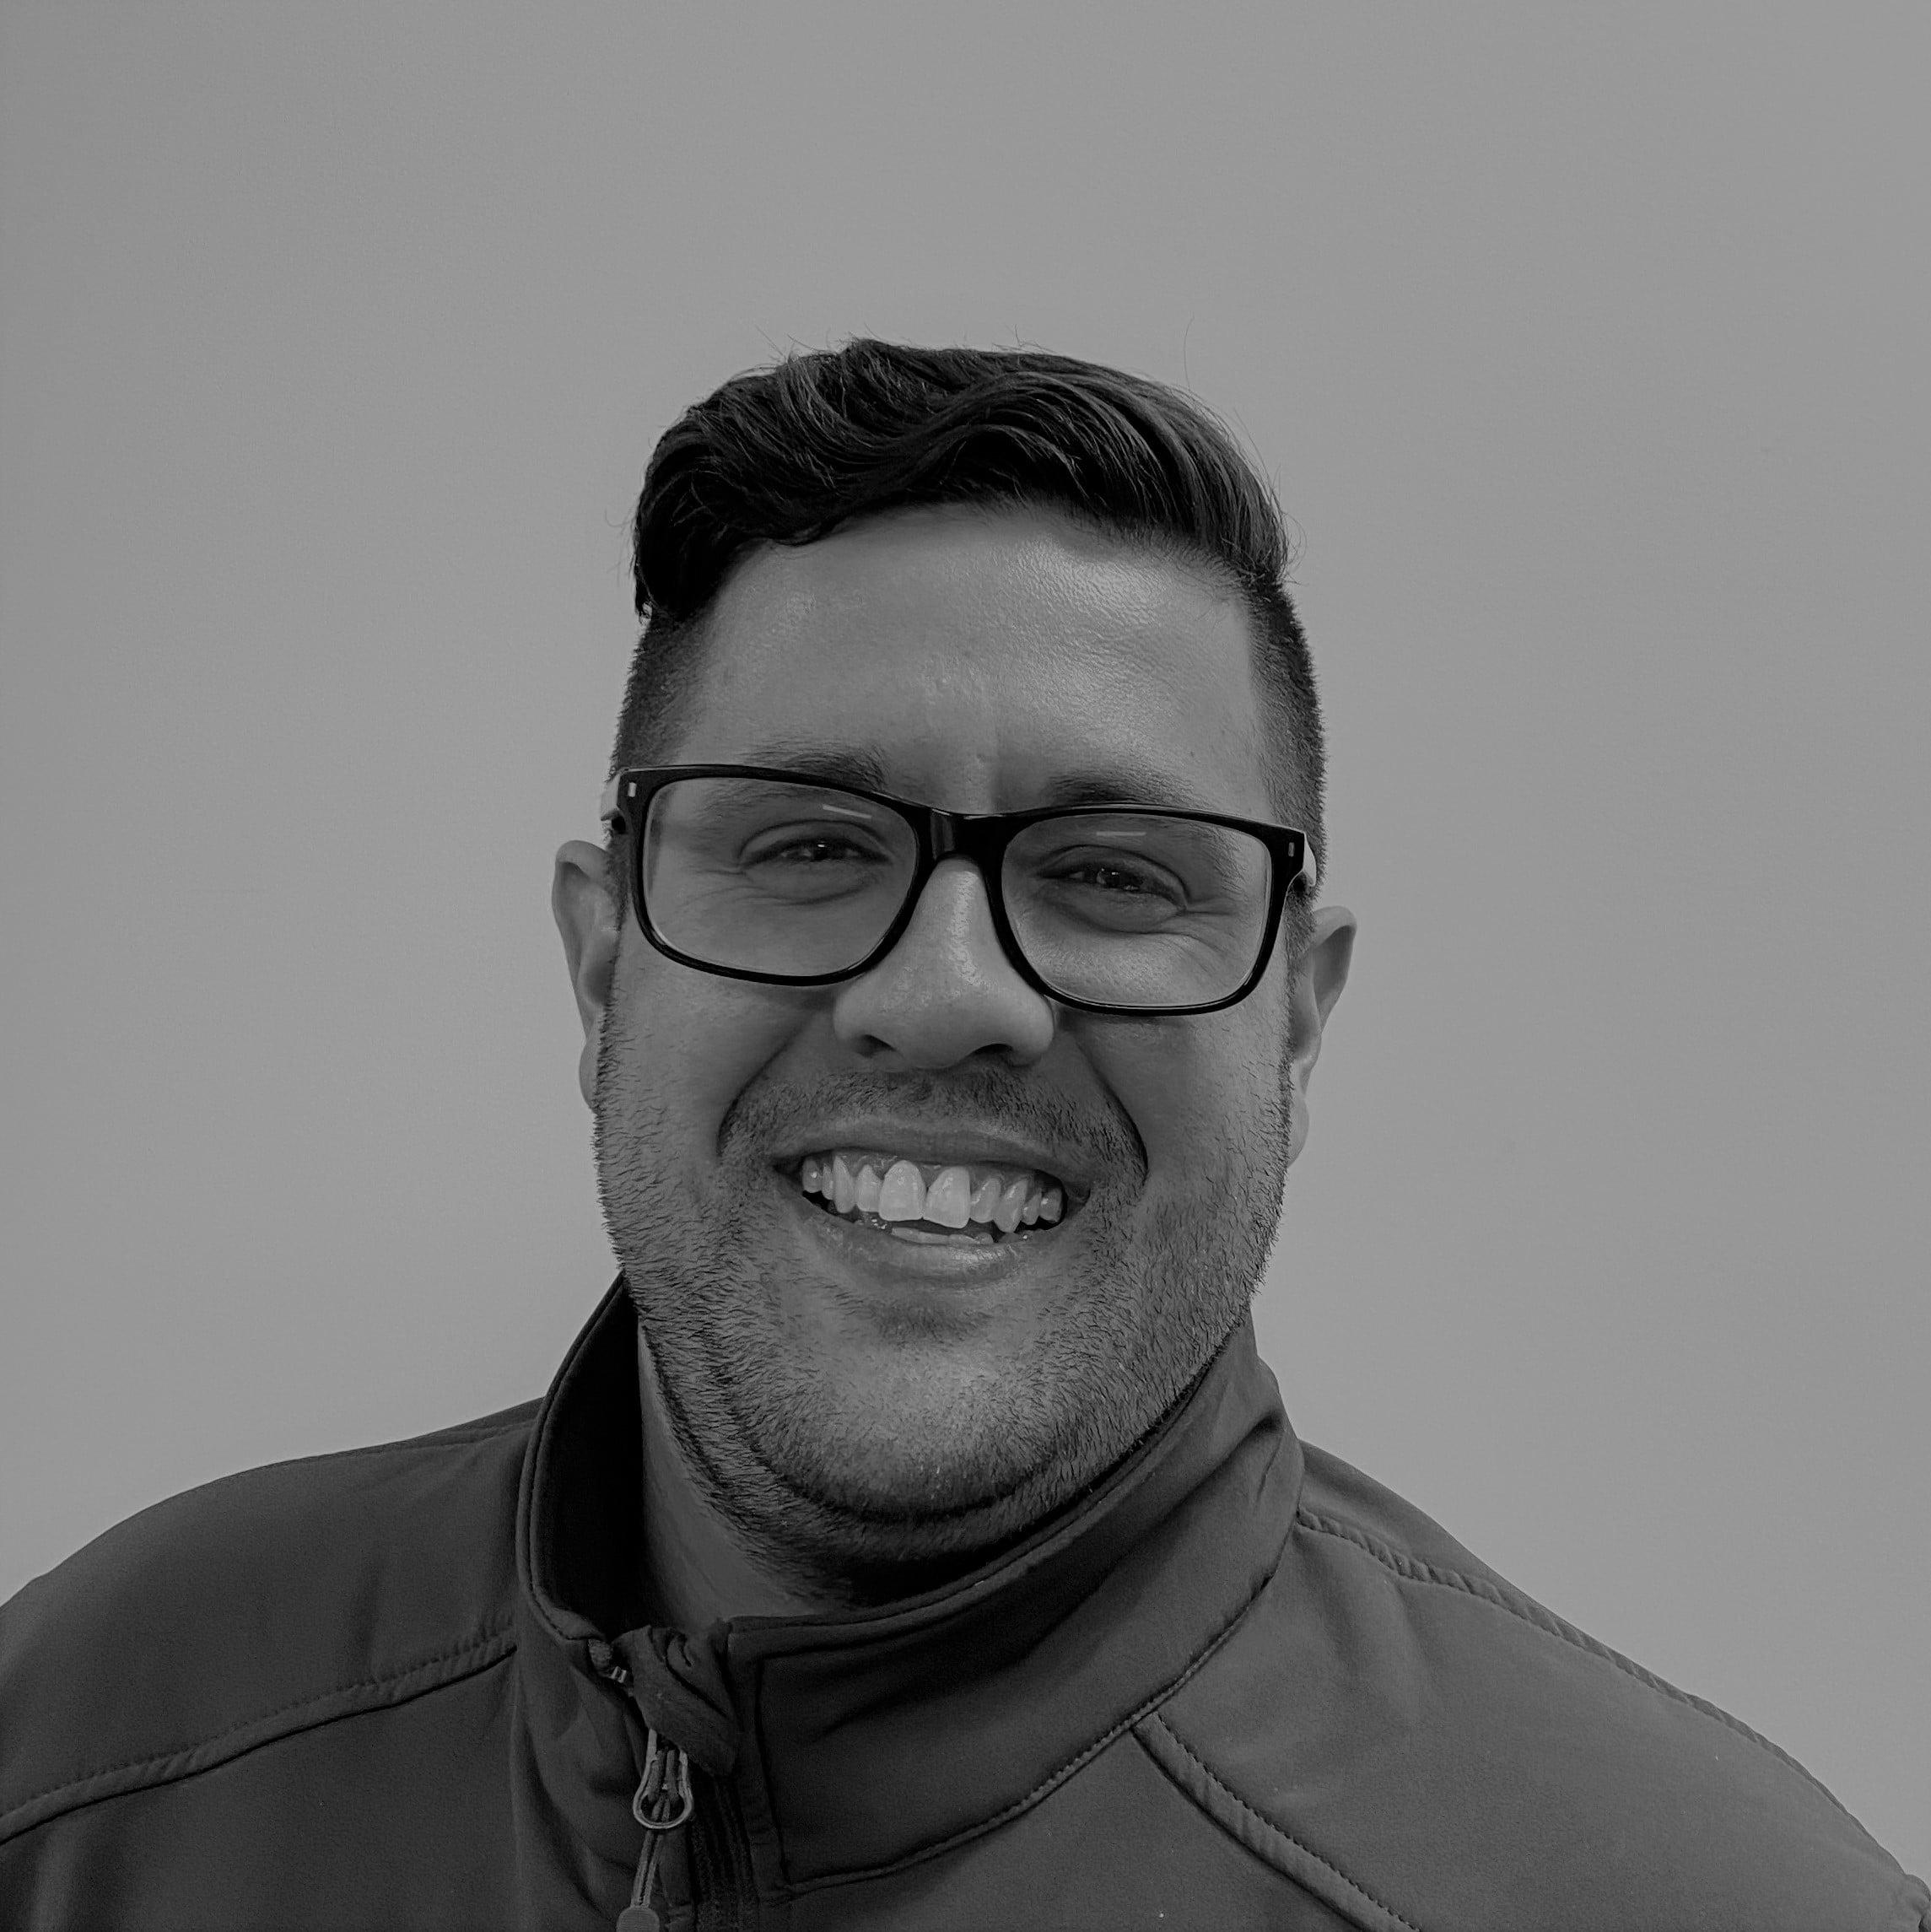 Daniel Pereira